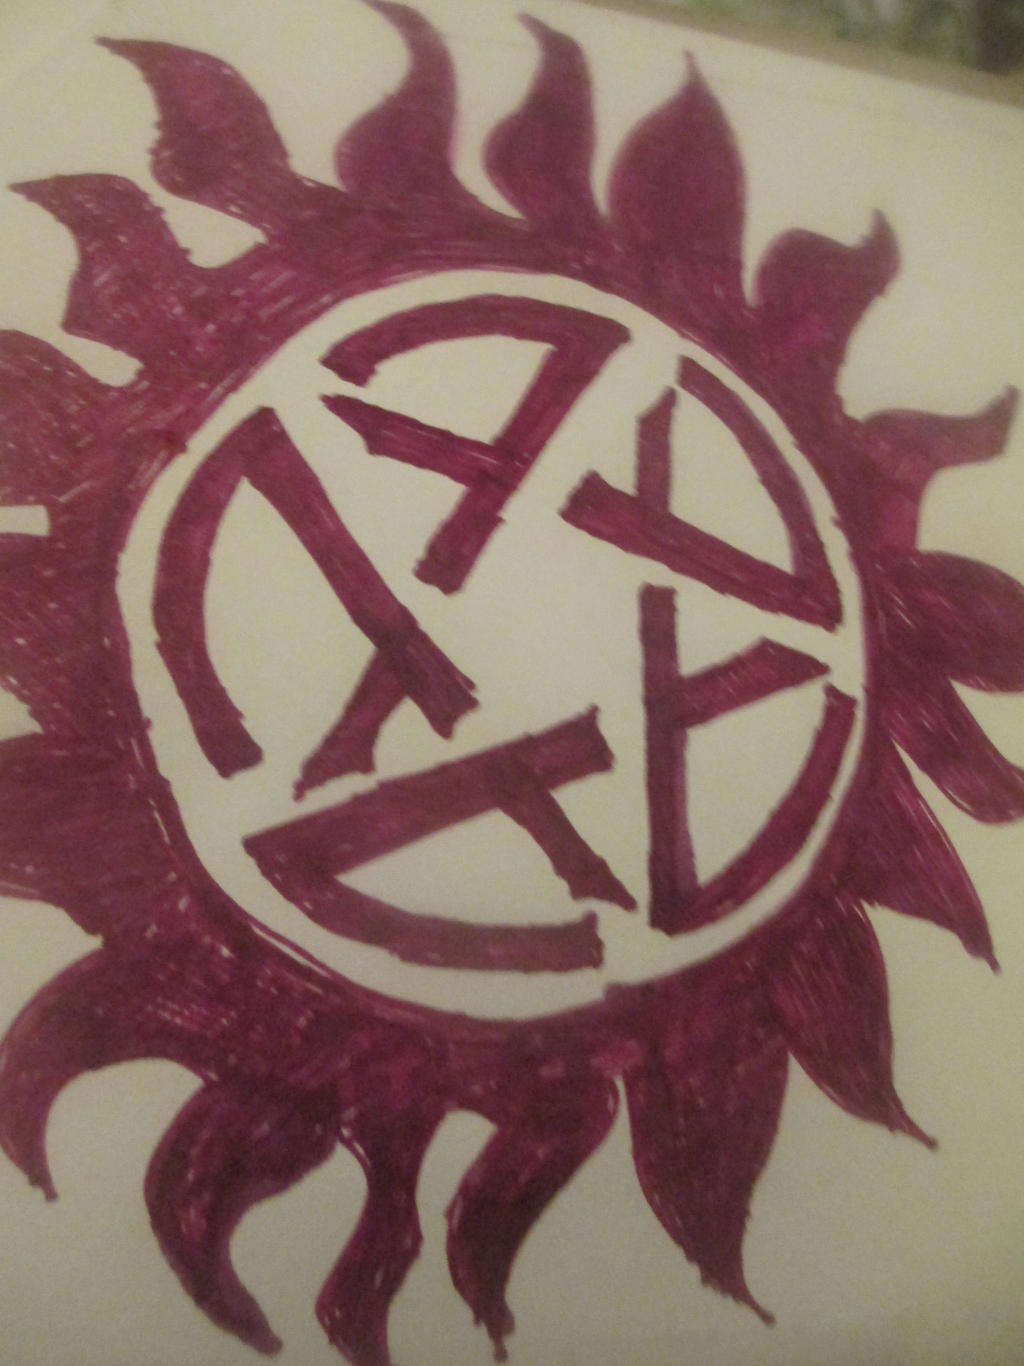 Supernatural Anti Demon Possession Symbol By Adrianknight On Deviantart